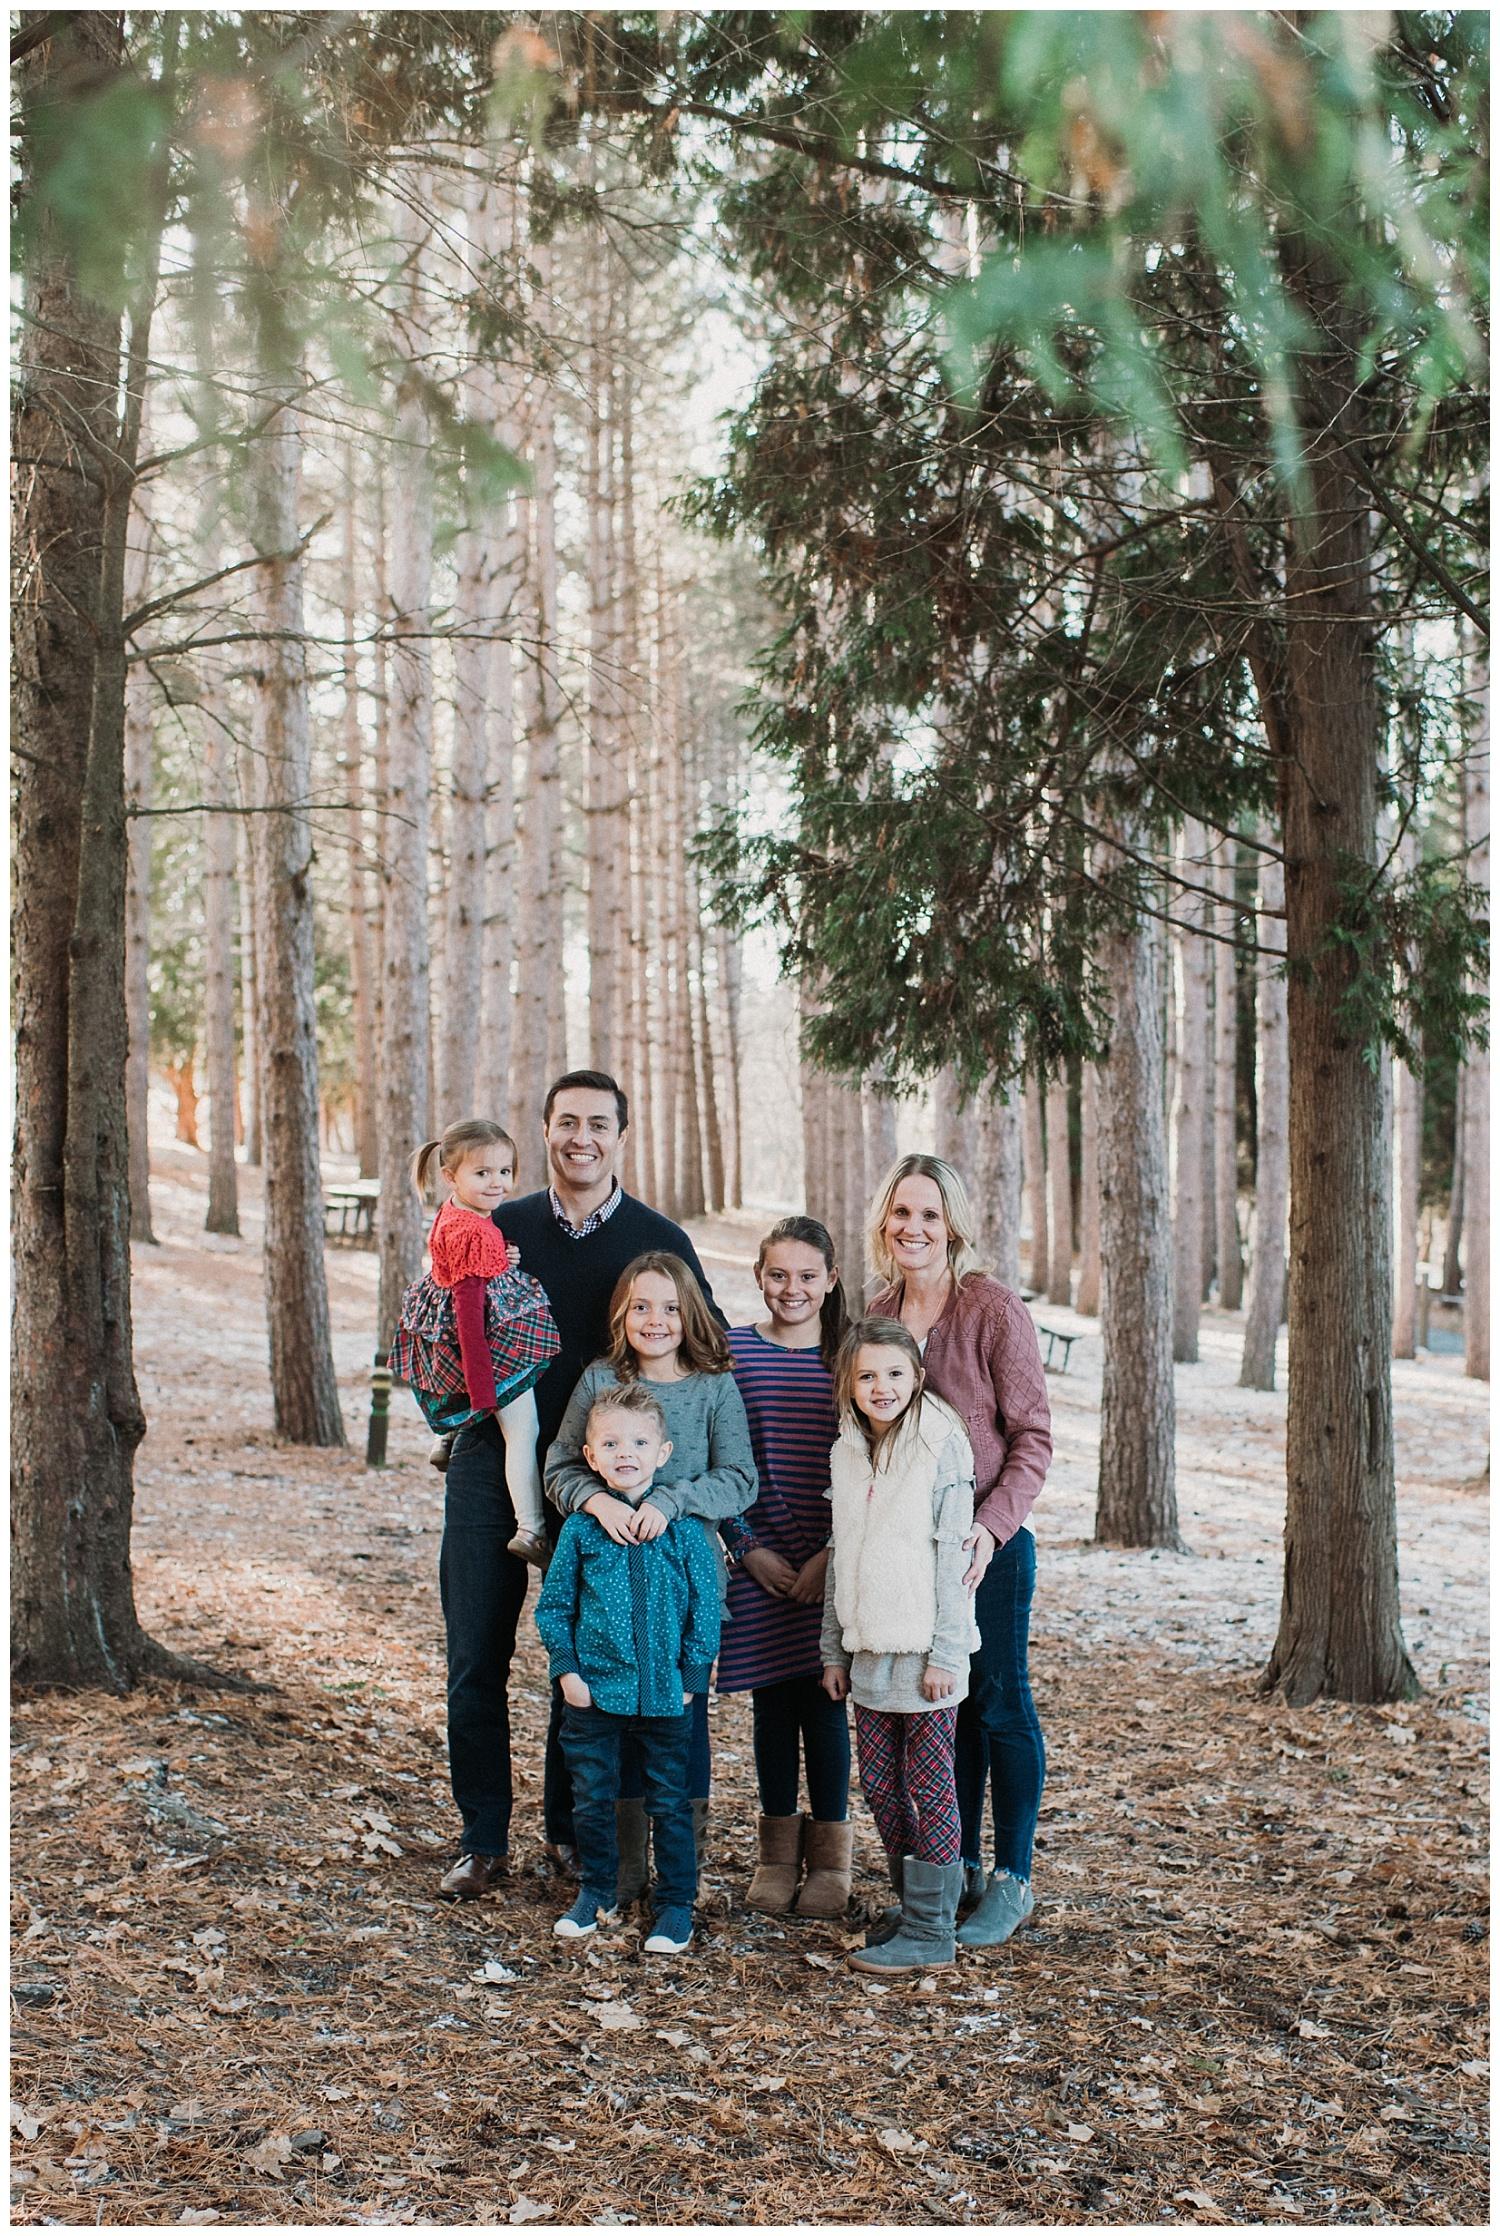 Pewaukee-family-photographer-2019 (10).jpg